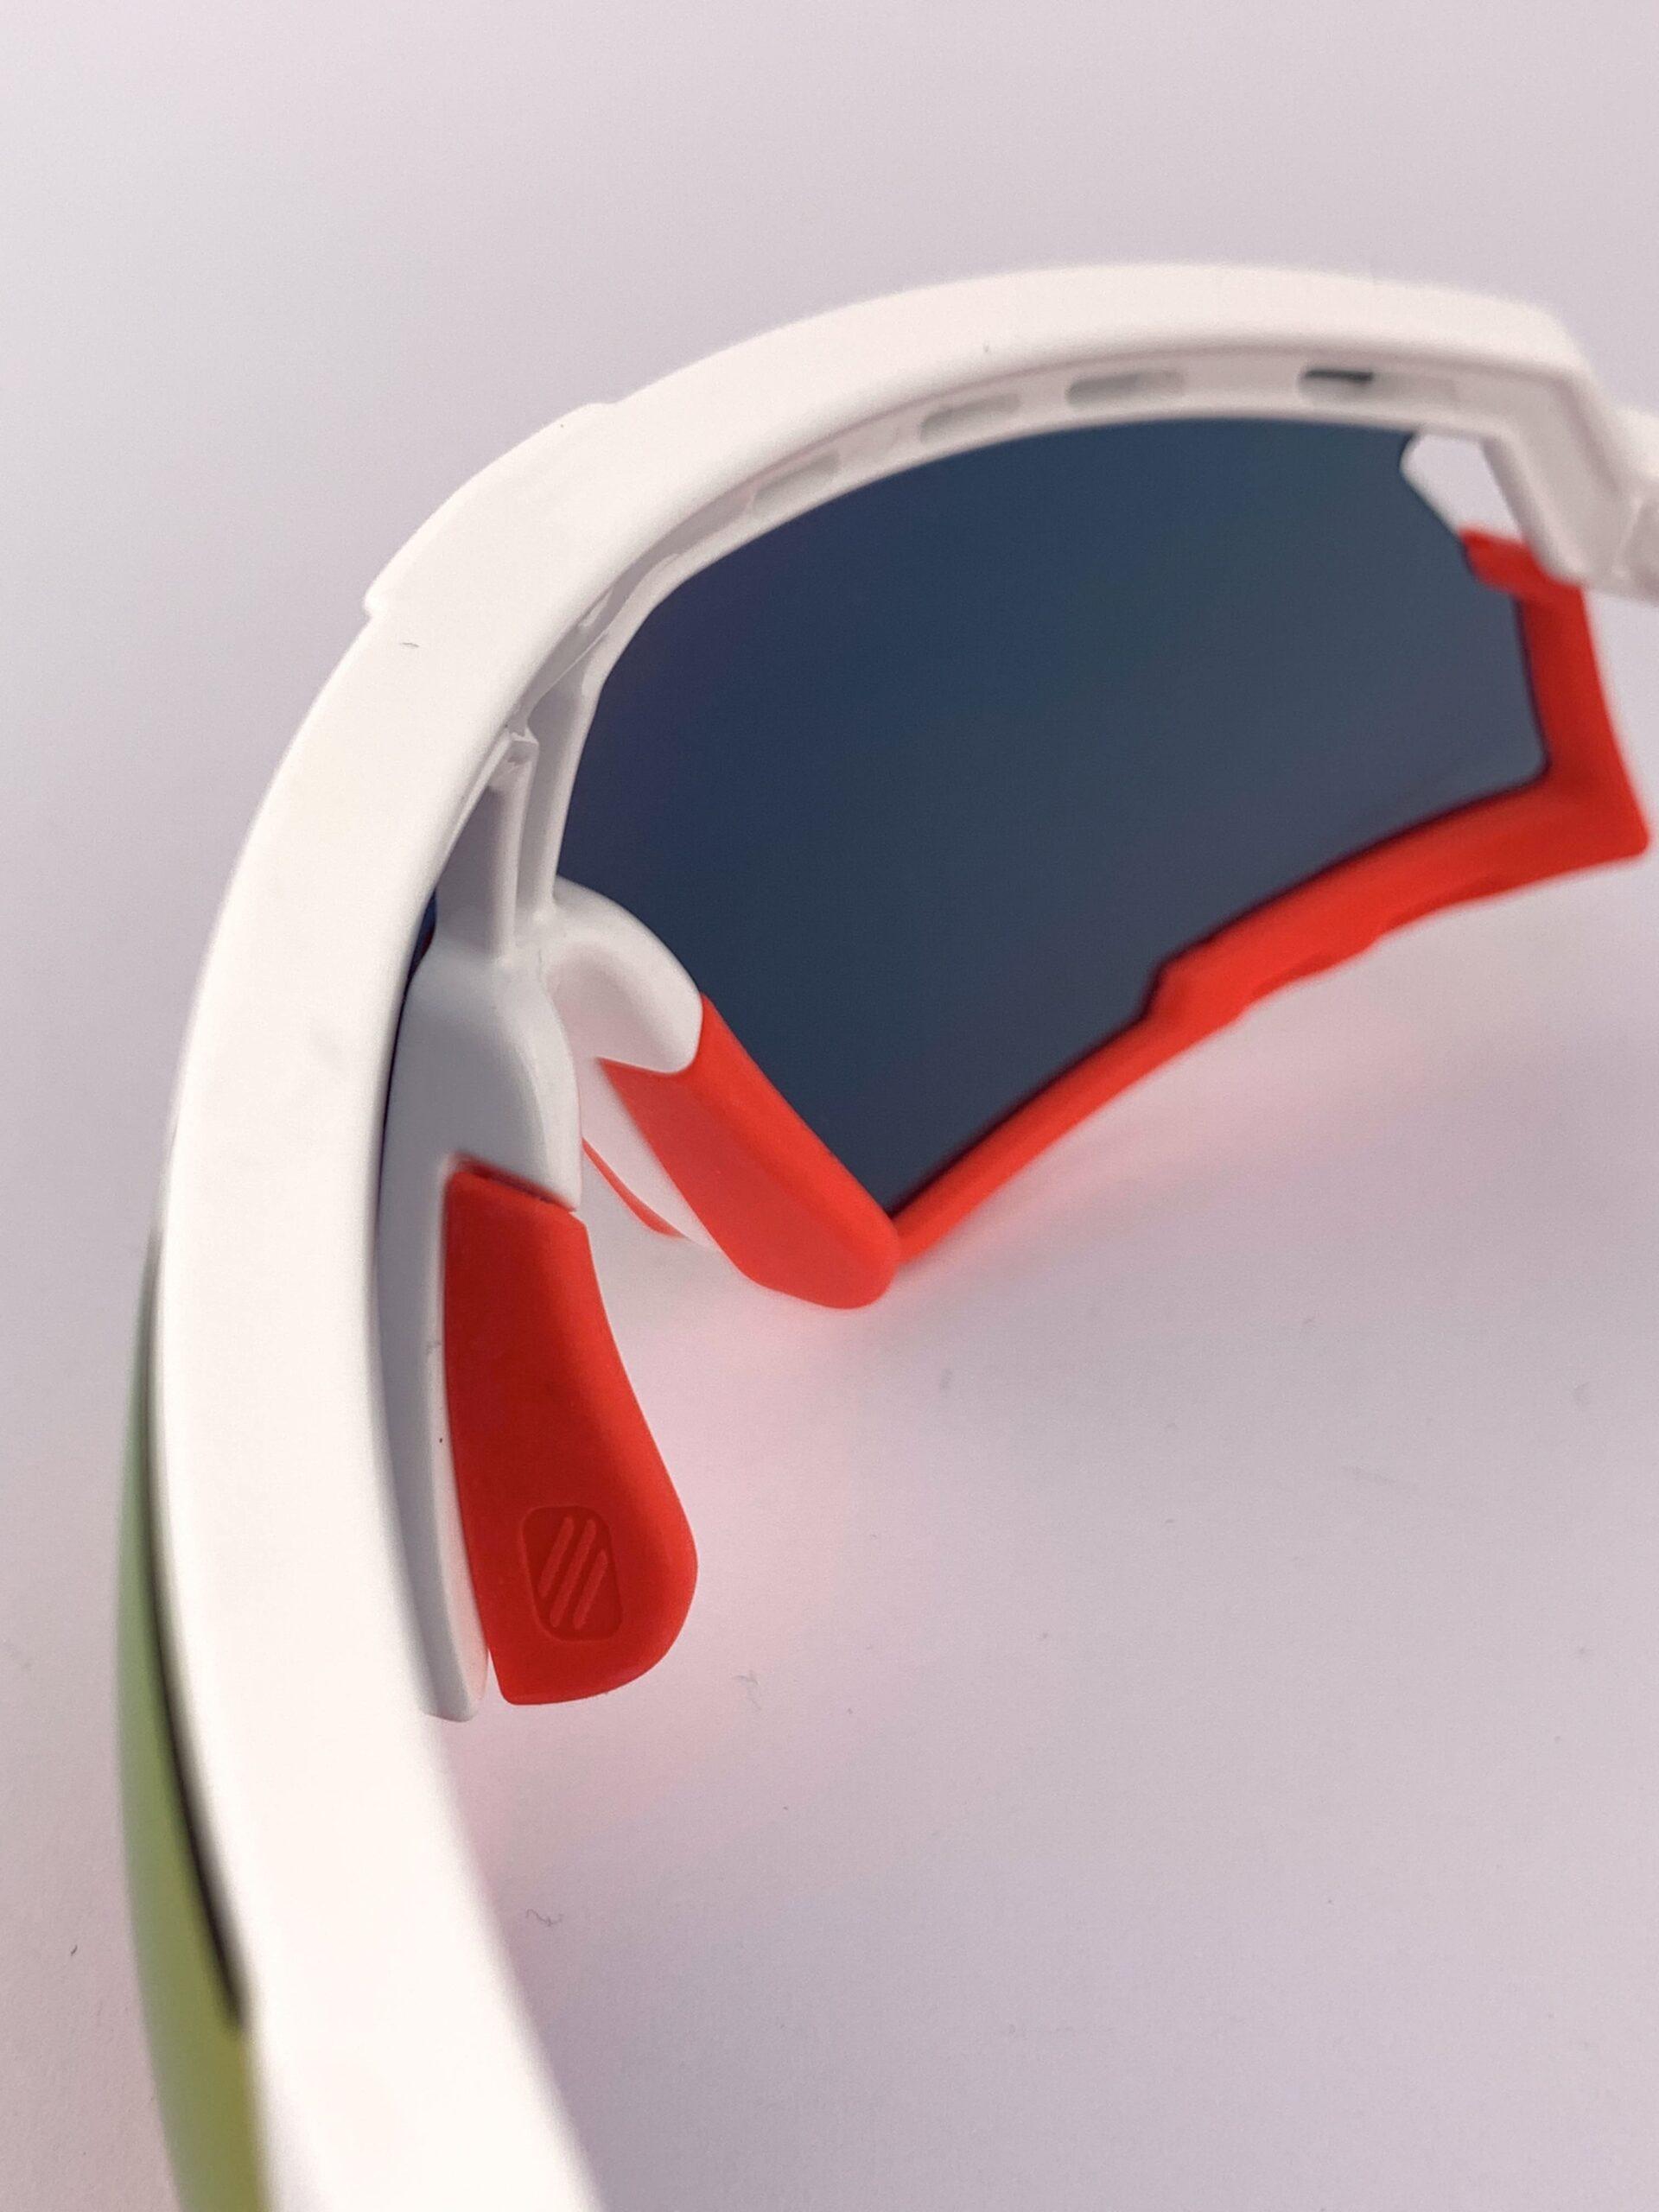 Cyklistické okuliare Defender červené zvrchu